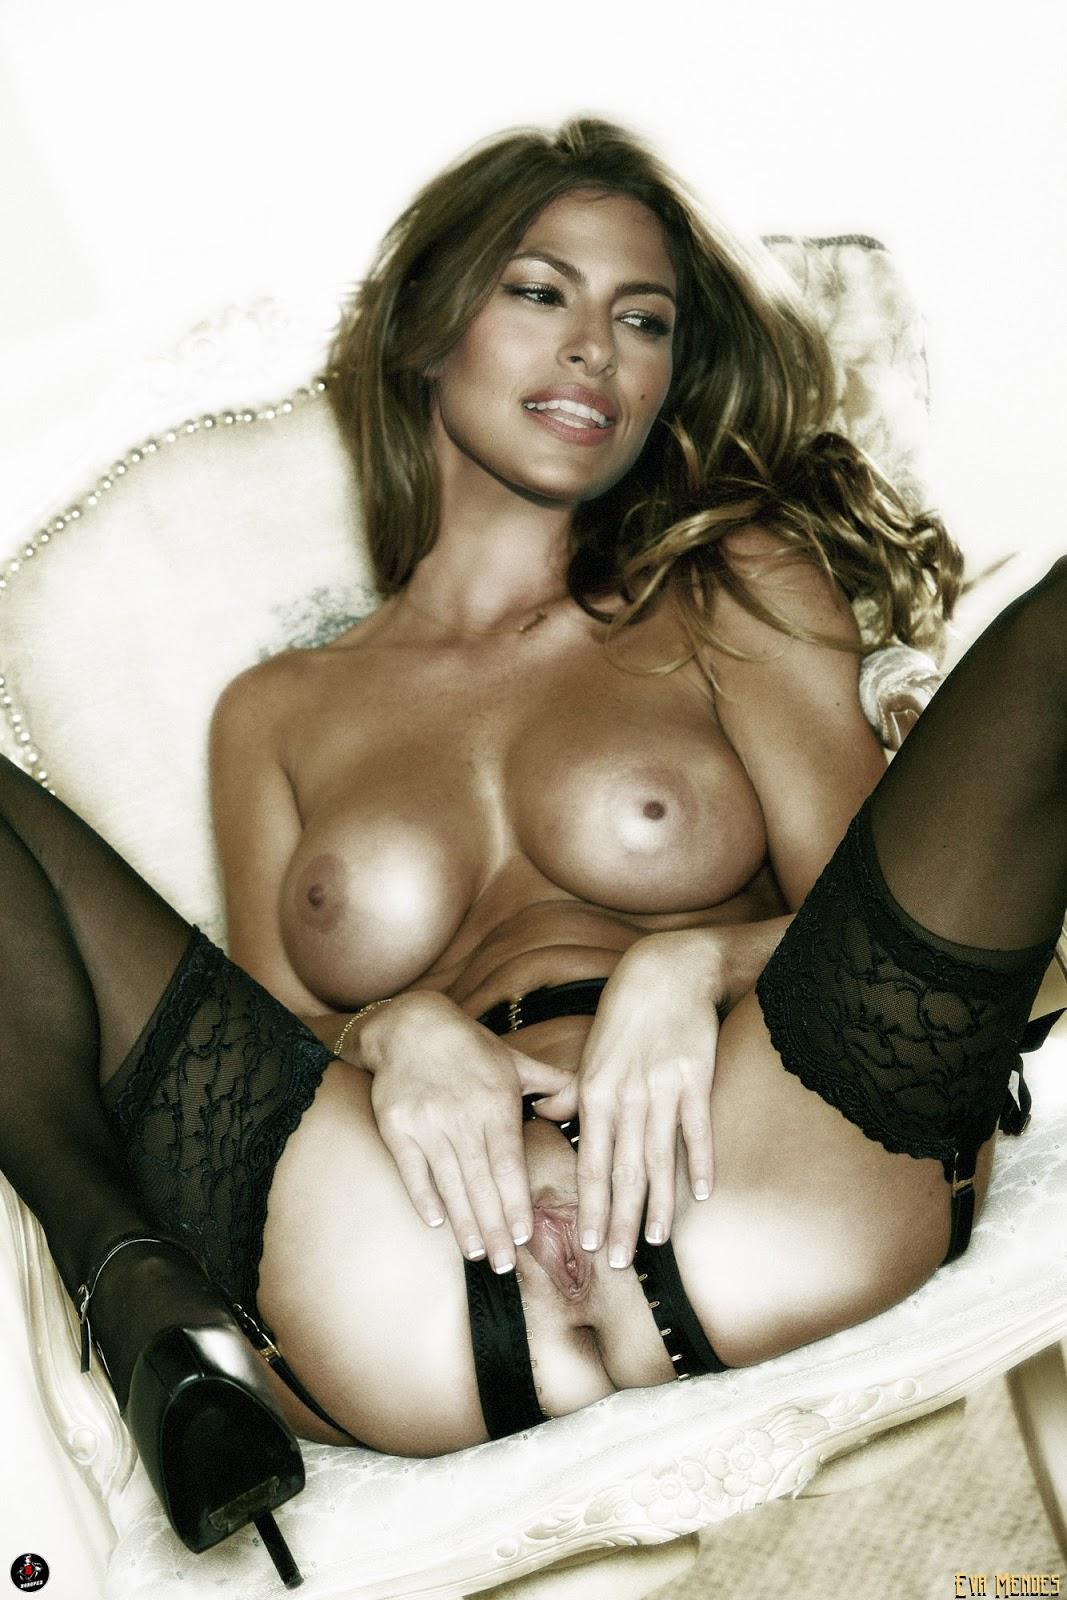 eva mendes showing boobs